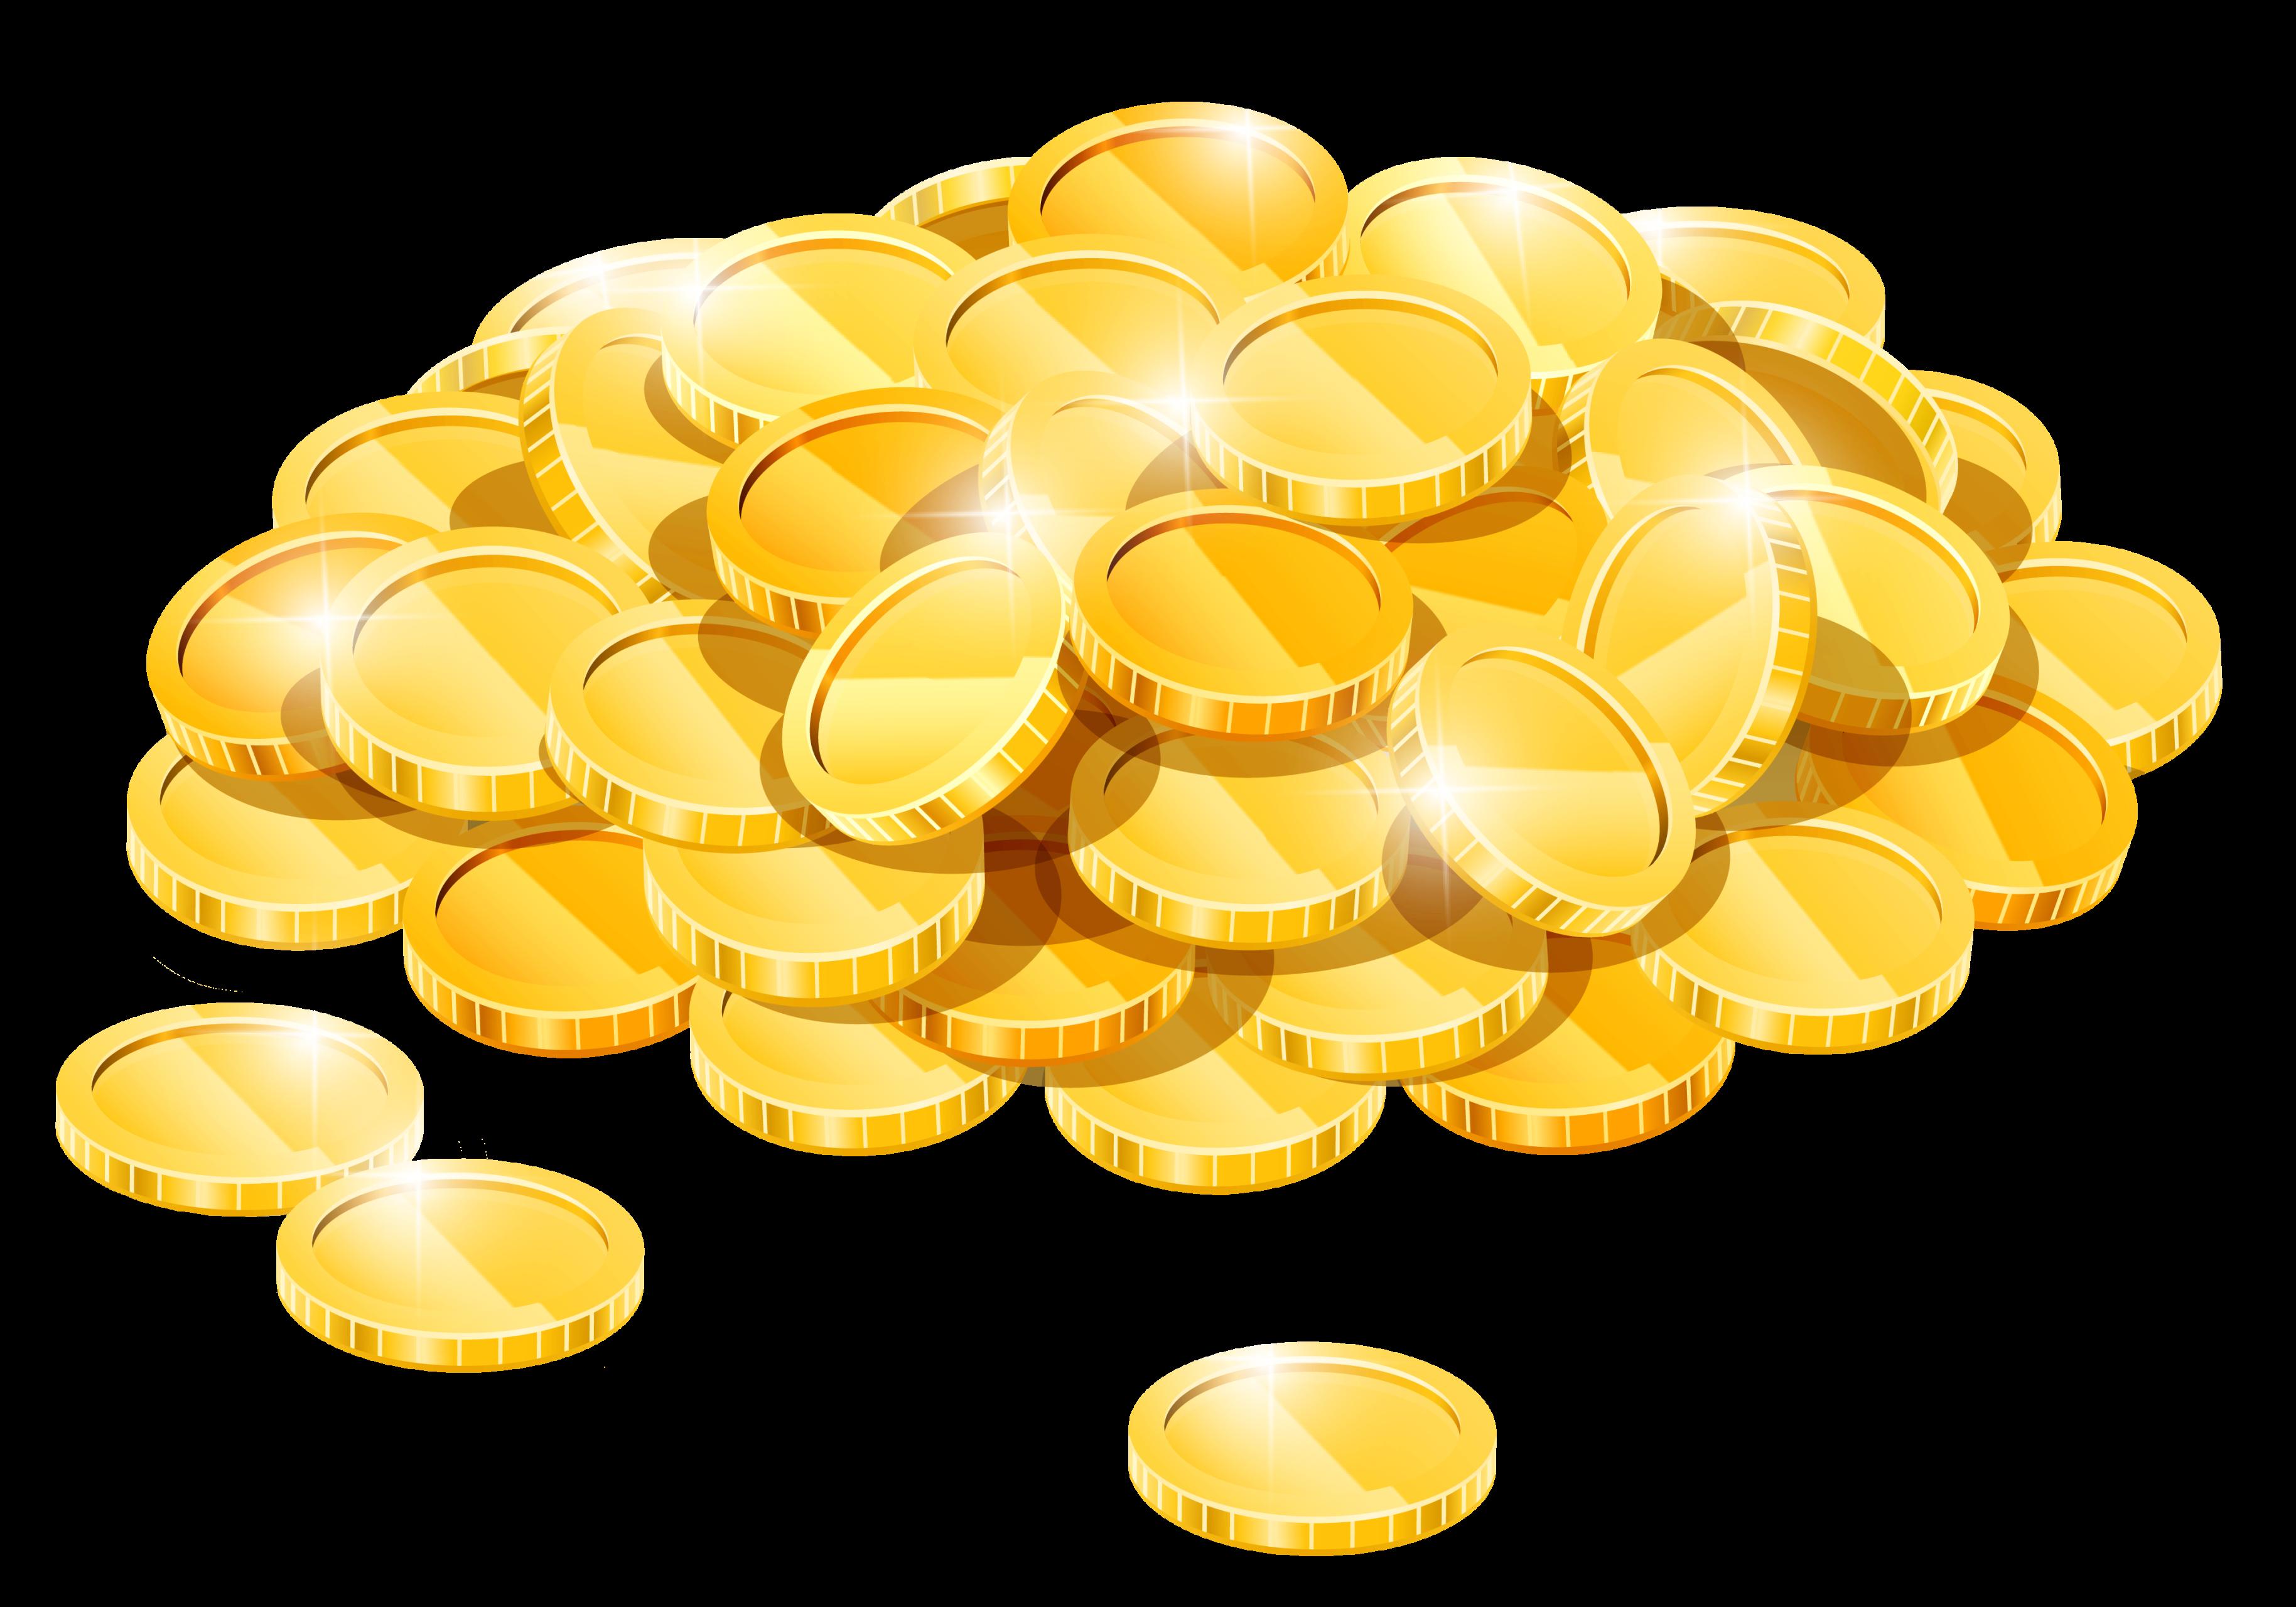 Картинки по запросу coins png